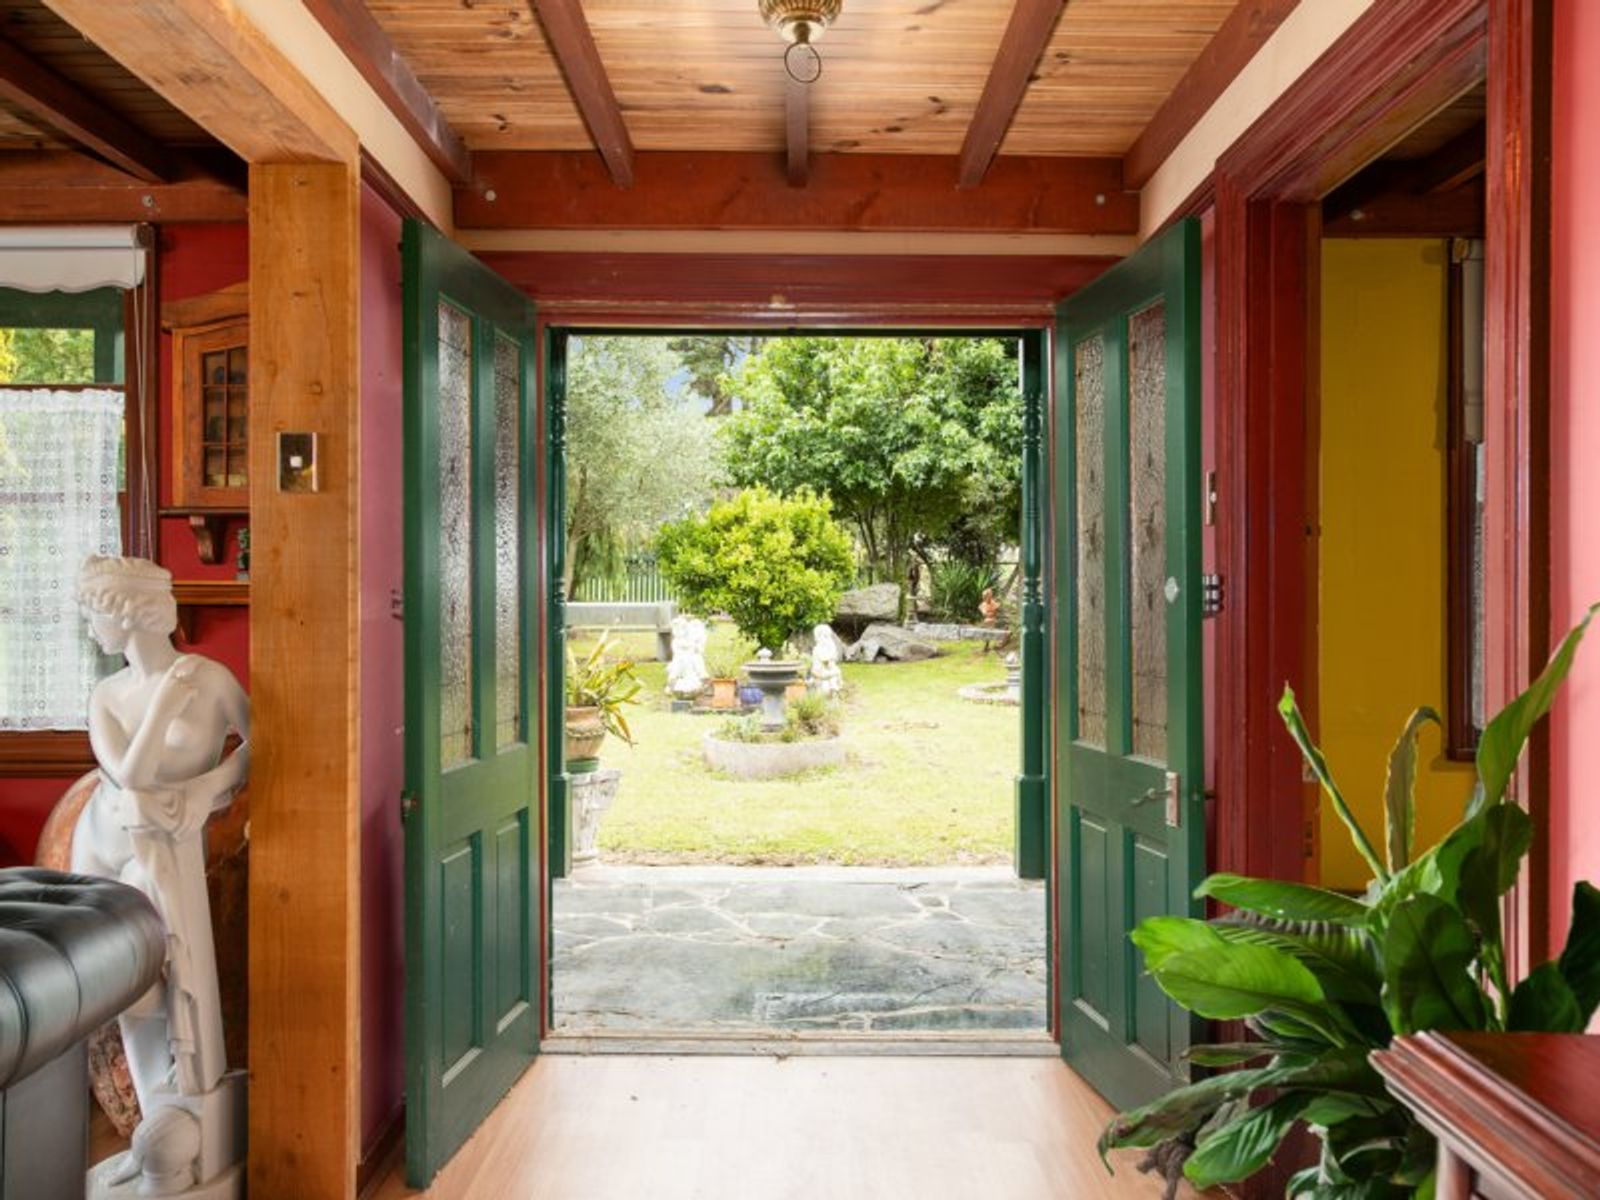 475 Korumburra-Wonthaggi Road, Korumburra, VIC 3950